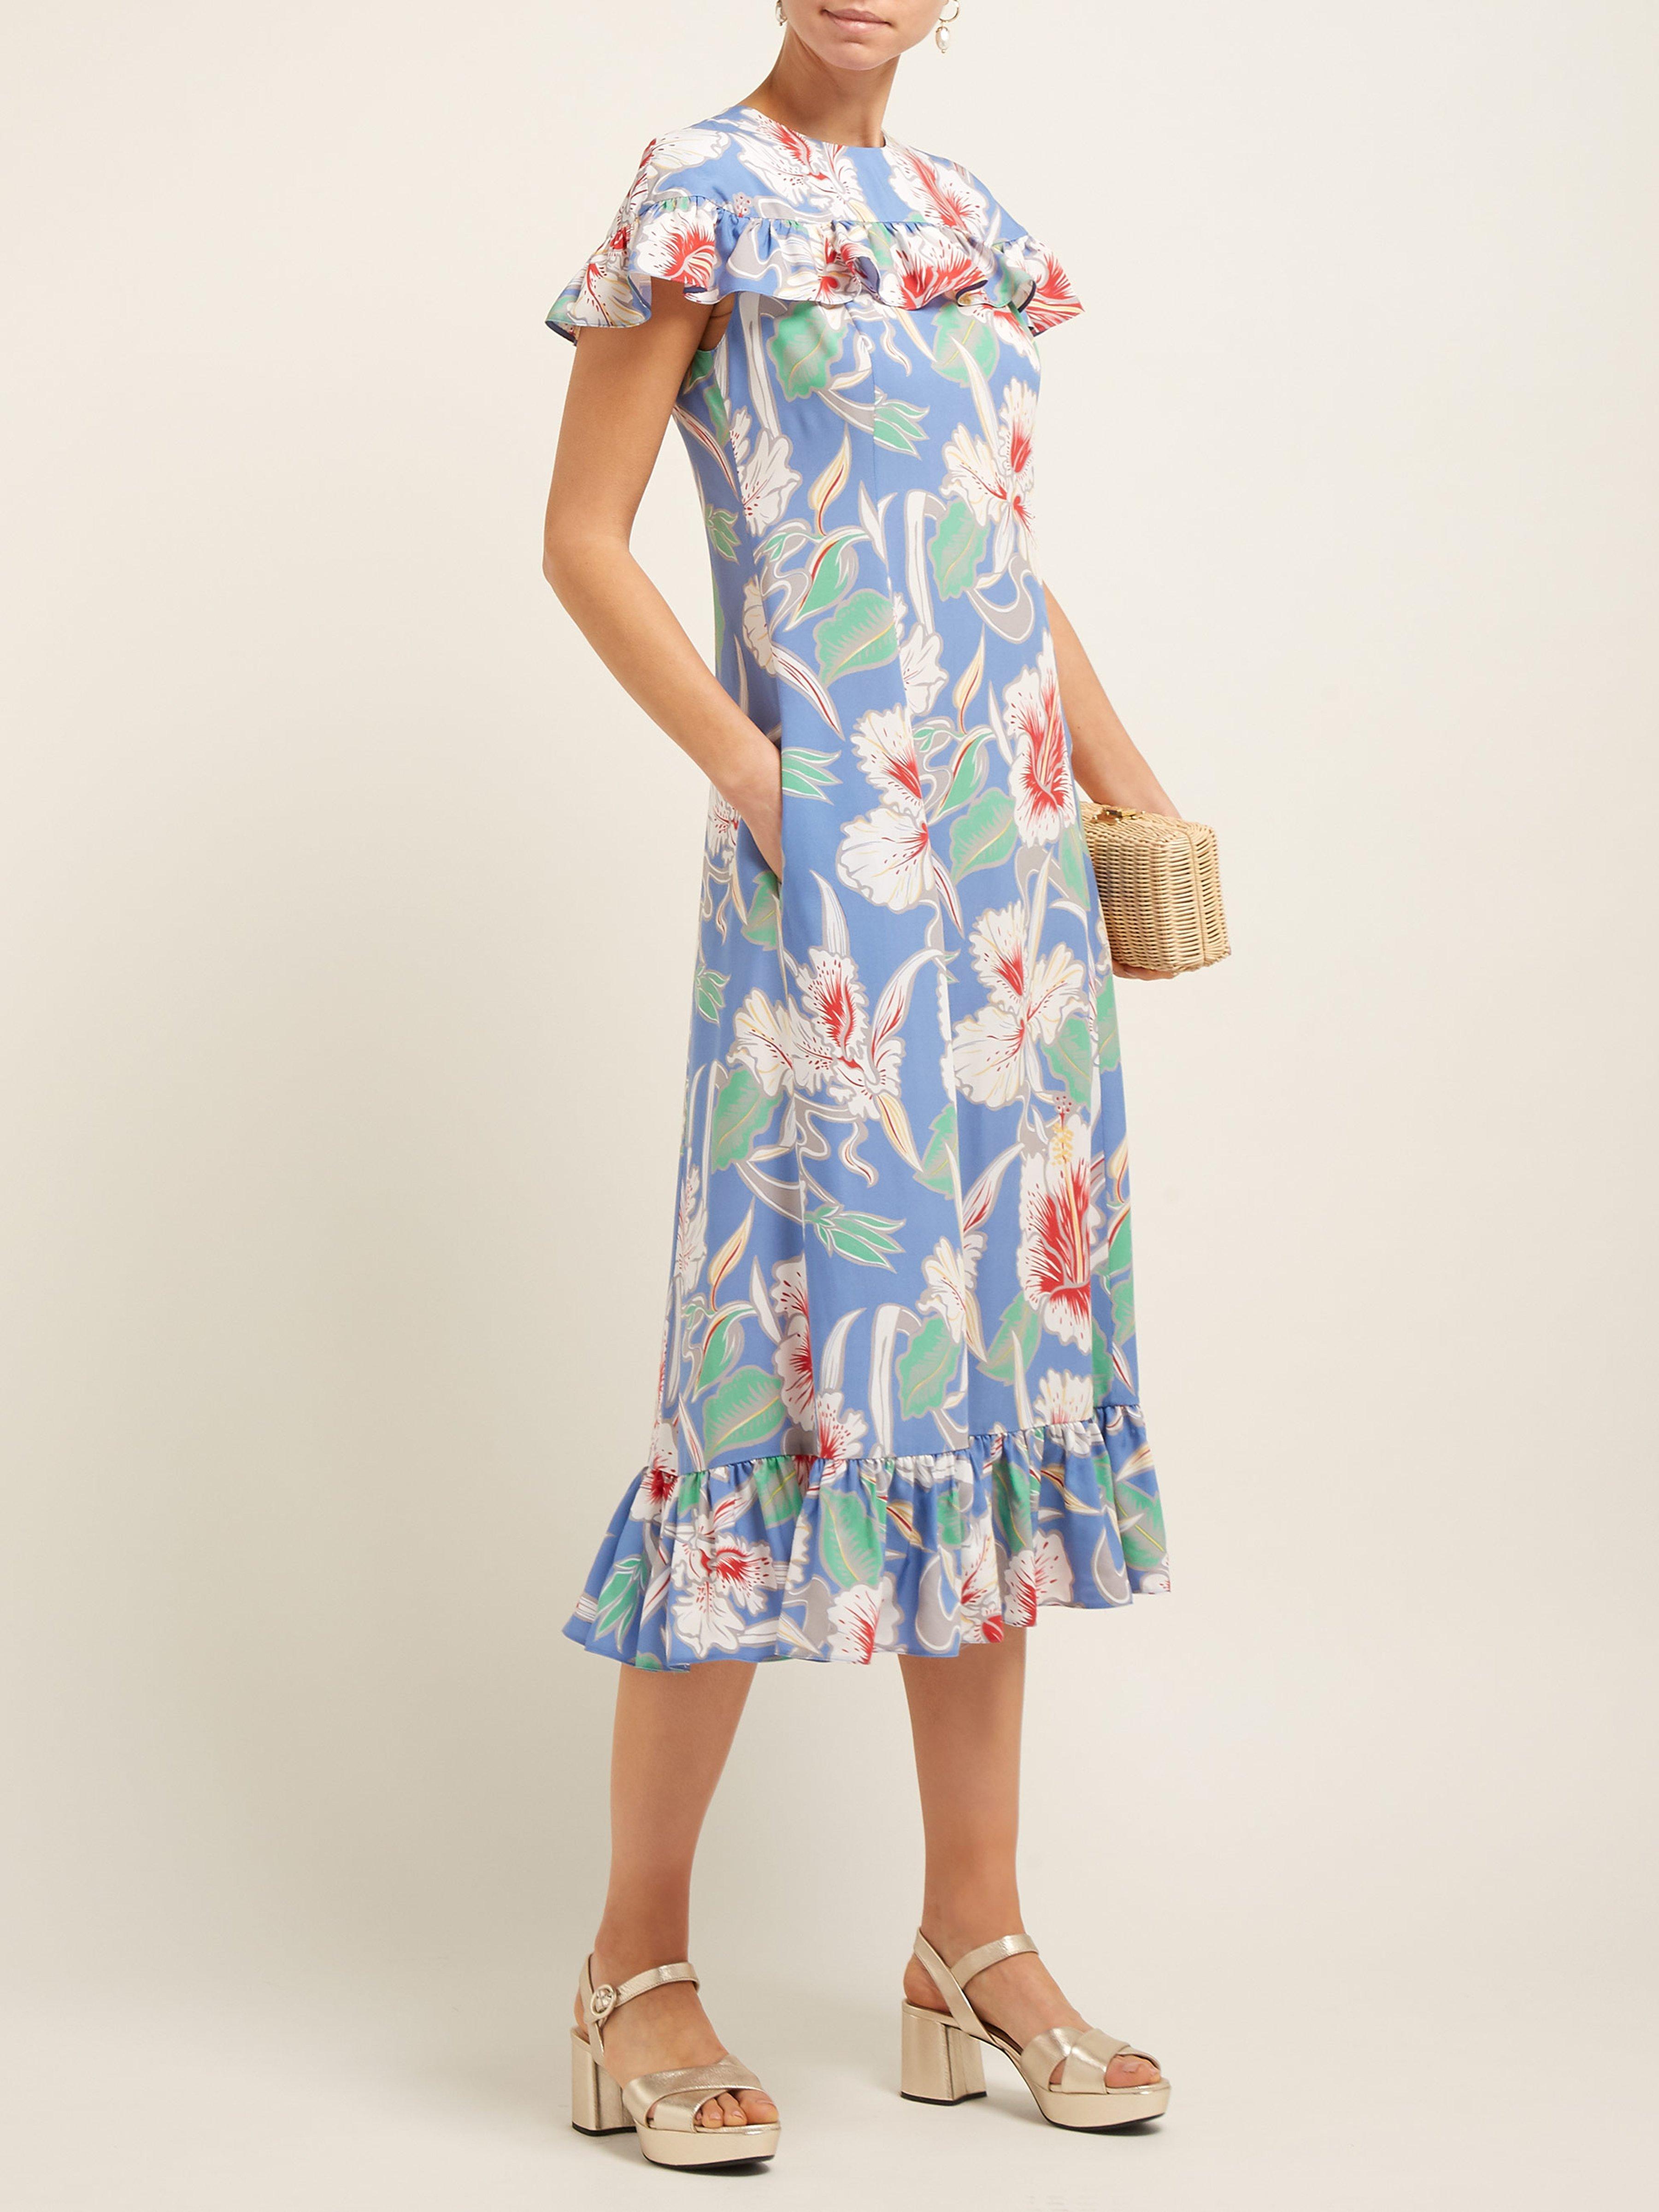 640409c9050 Valentino Hibiscus Print Ruffle Trimmed Crepe Midi Dress in Blue - Lyst